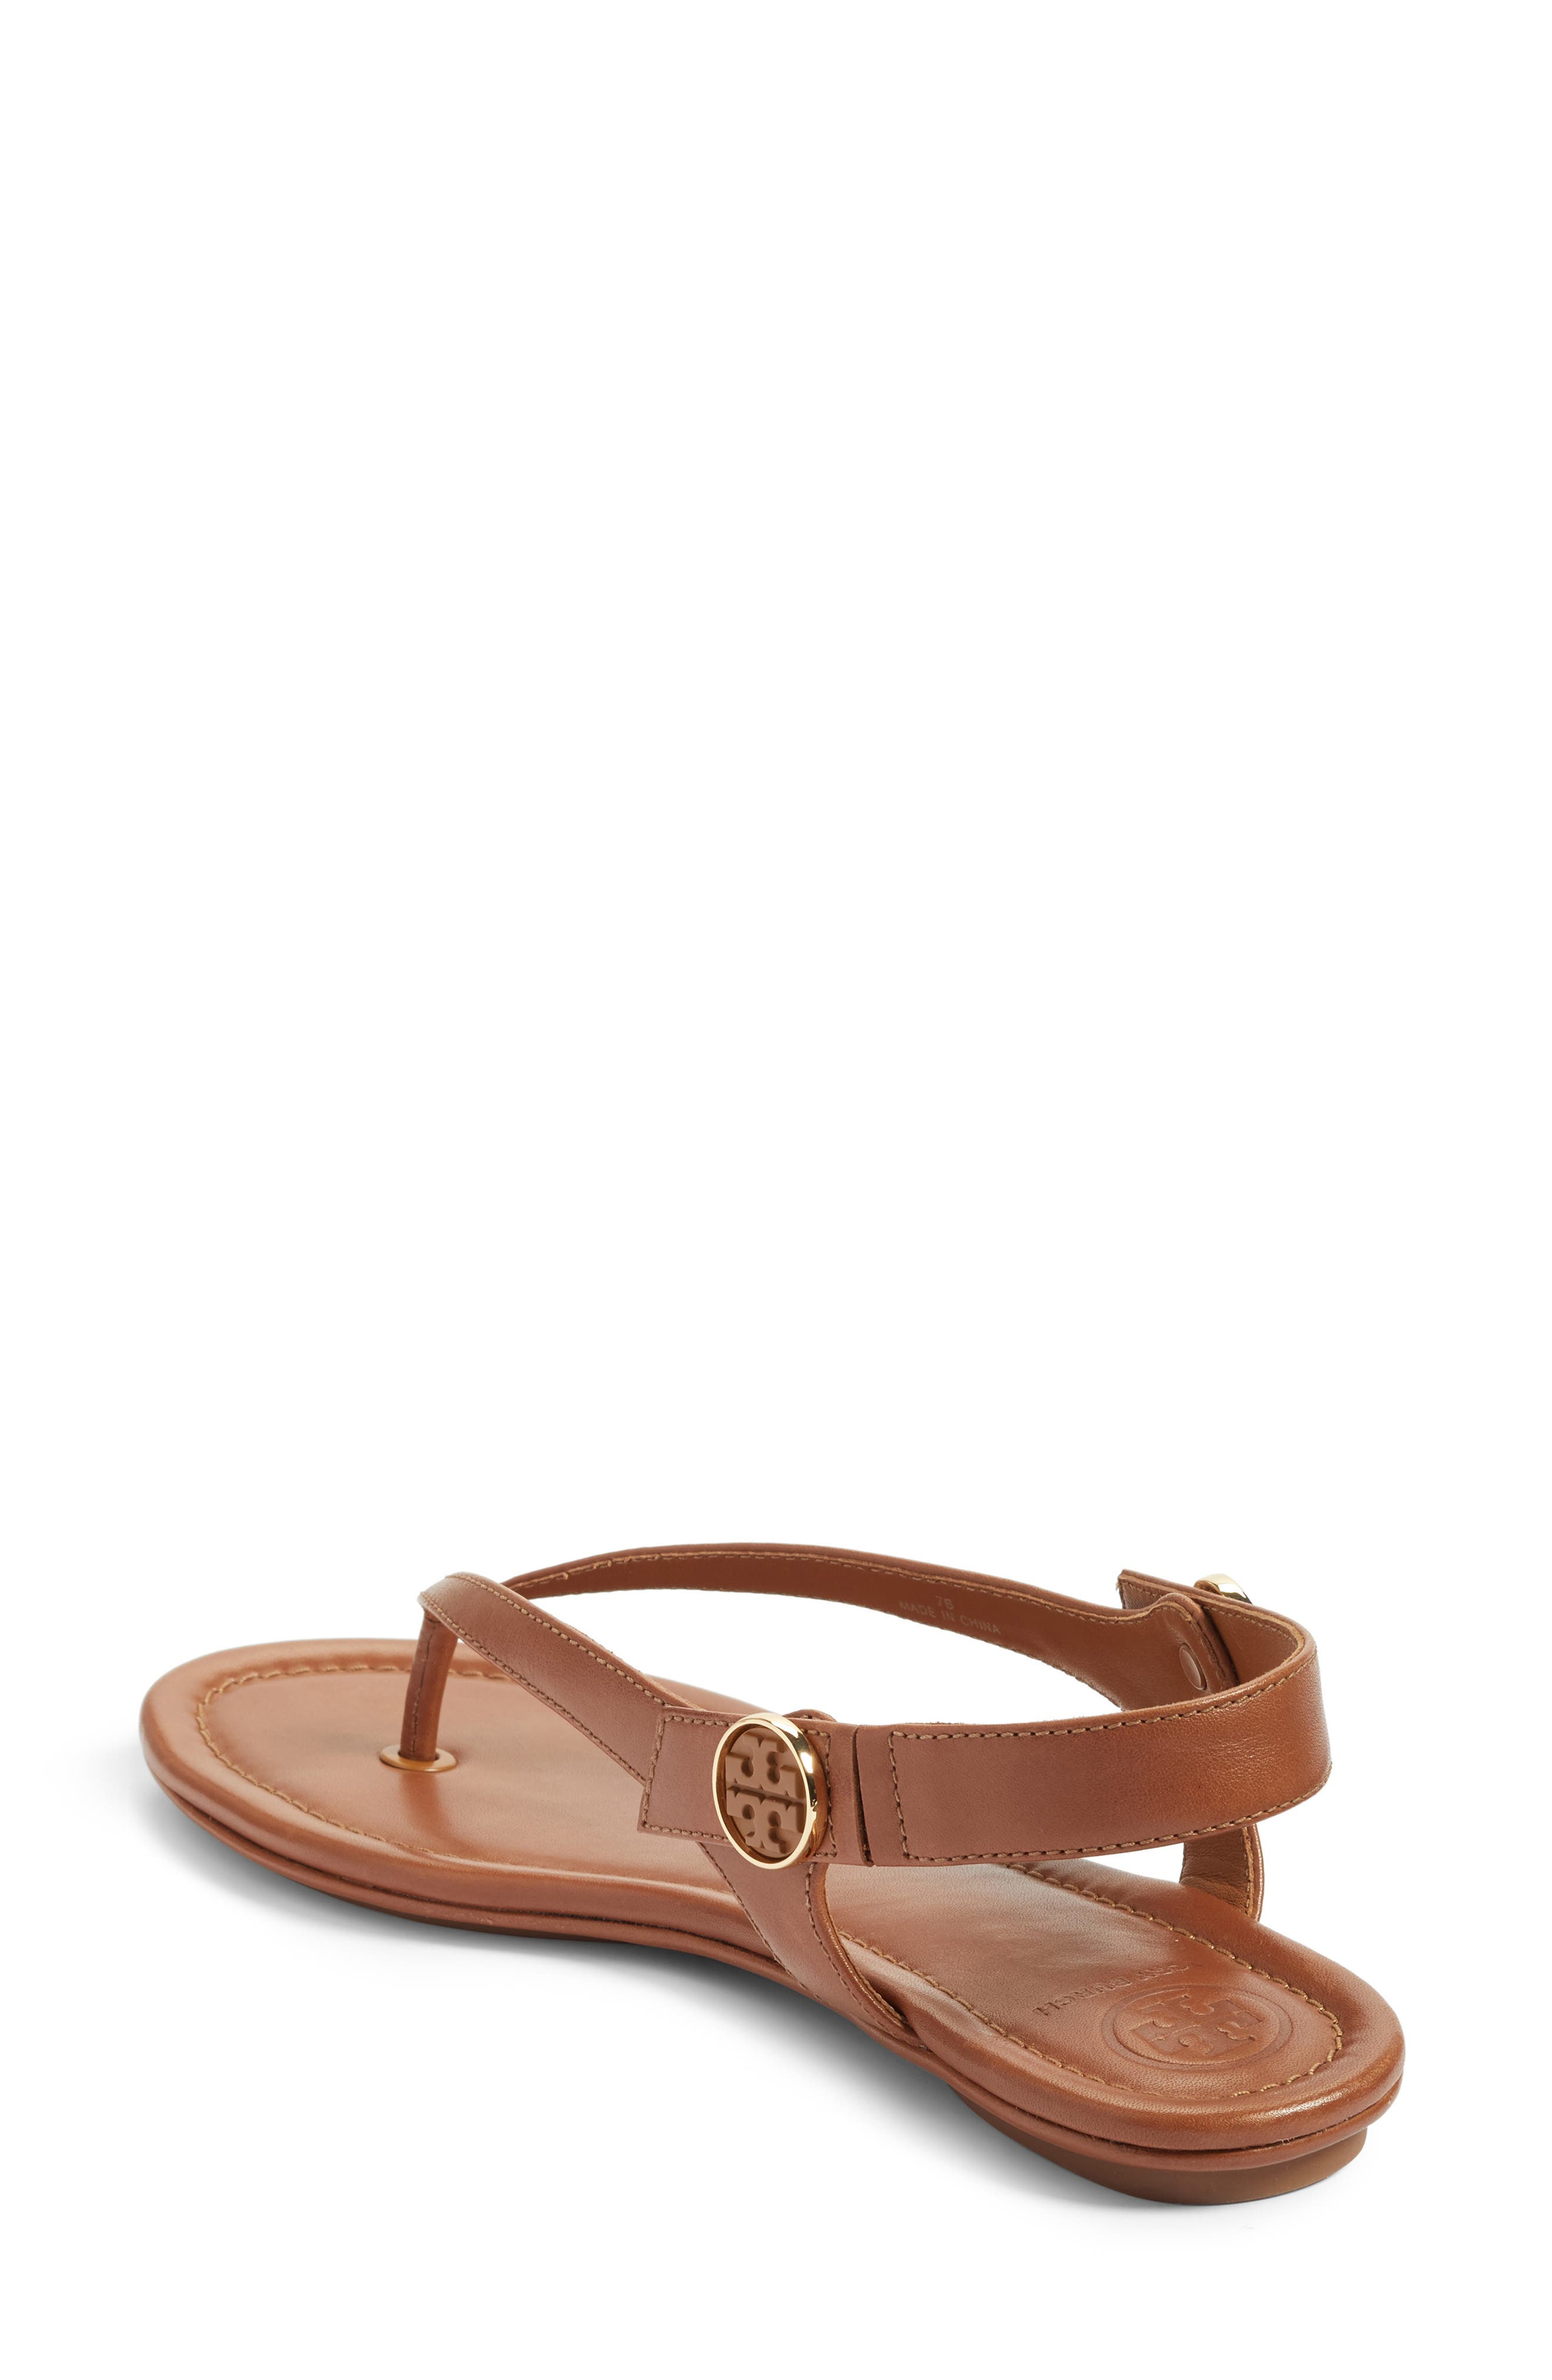 Alternate Image 3  - Tory Burch Minnie Travel Thong Sandal (Women)